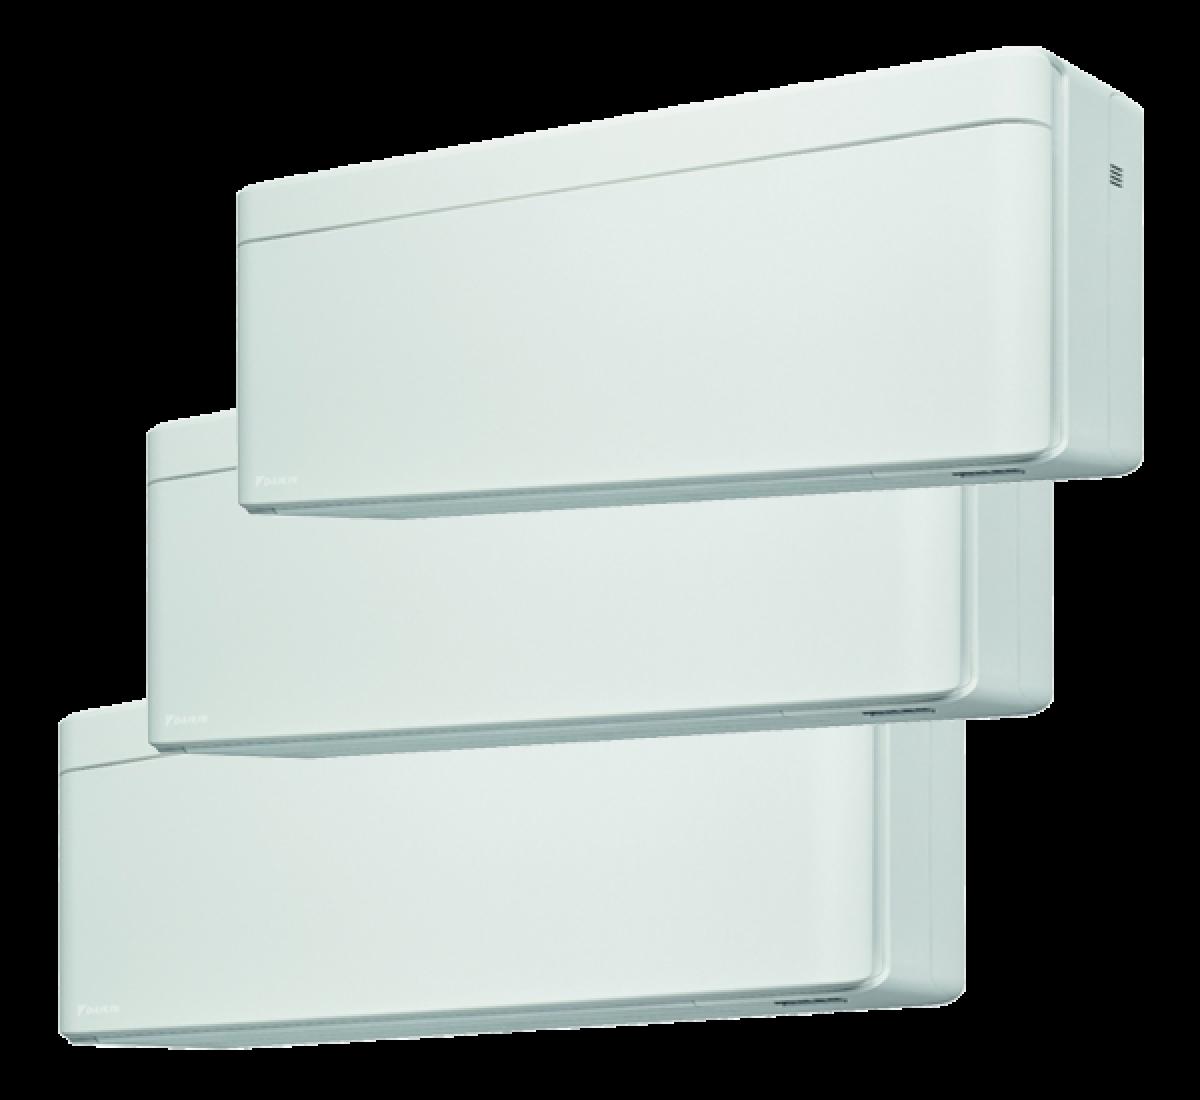 Multisplit Aire Acondicionado Equipo Interior Daikin Serie Comfora FTXA35-AW-FTXA20-AW-FTXA20-AW